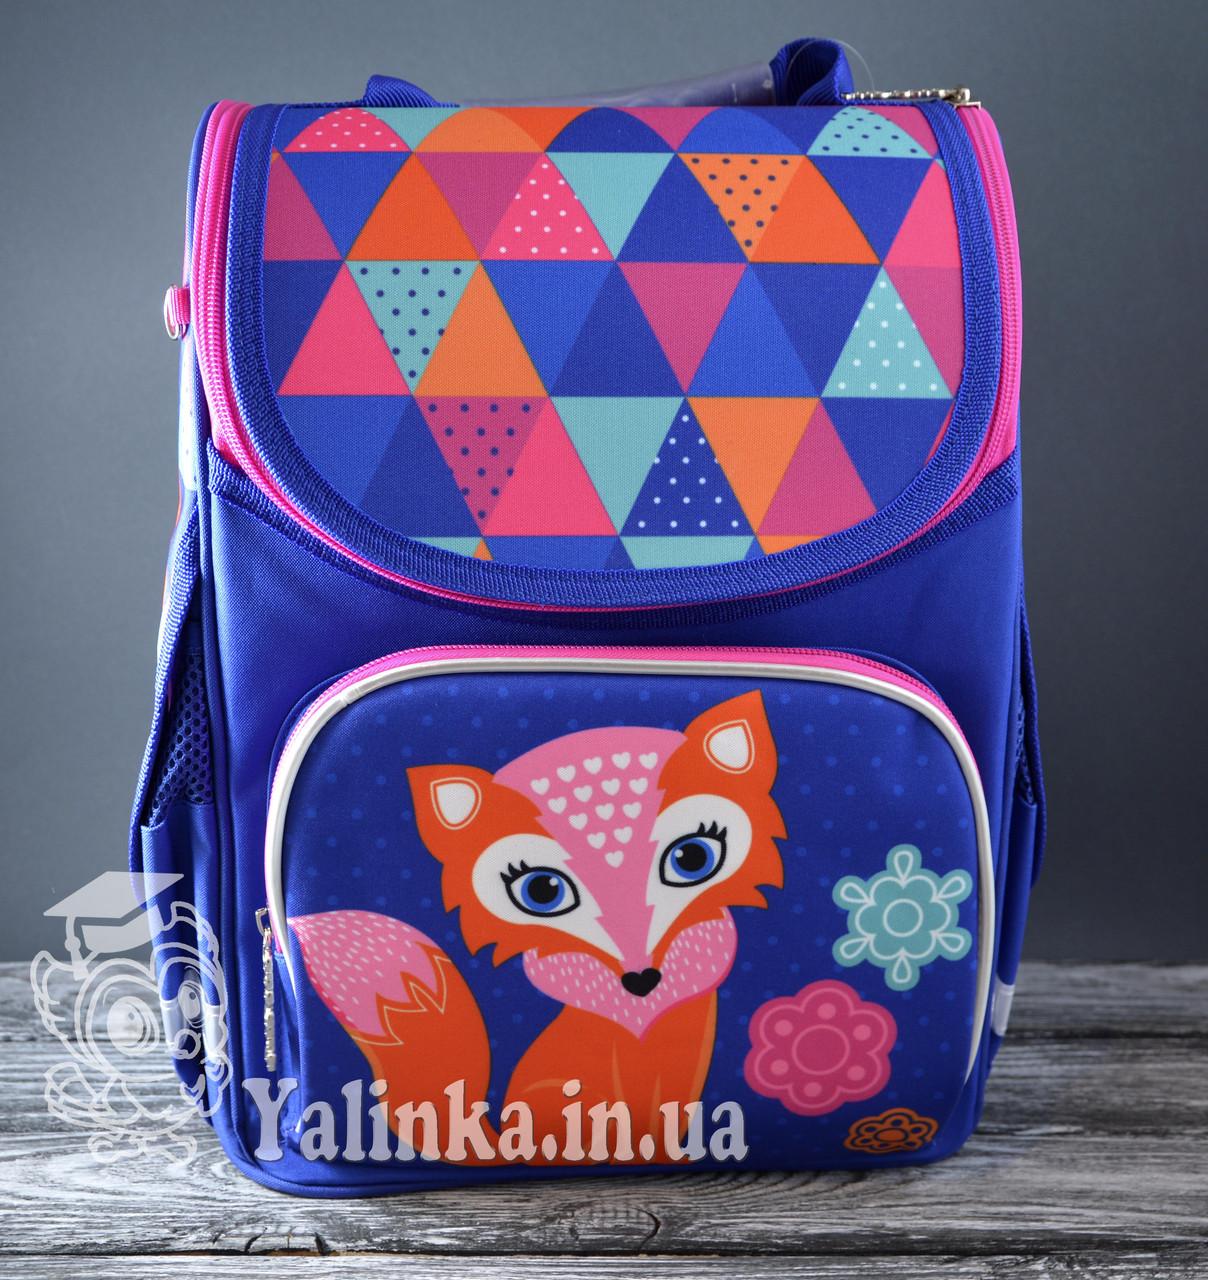 Рюкзак каркасный  PG-11 Fox 554505  Smart